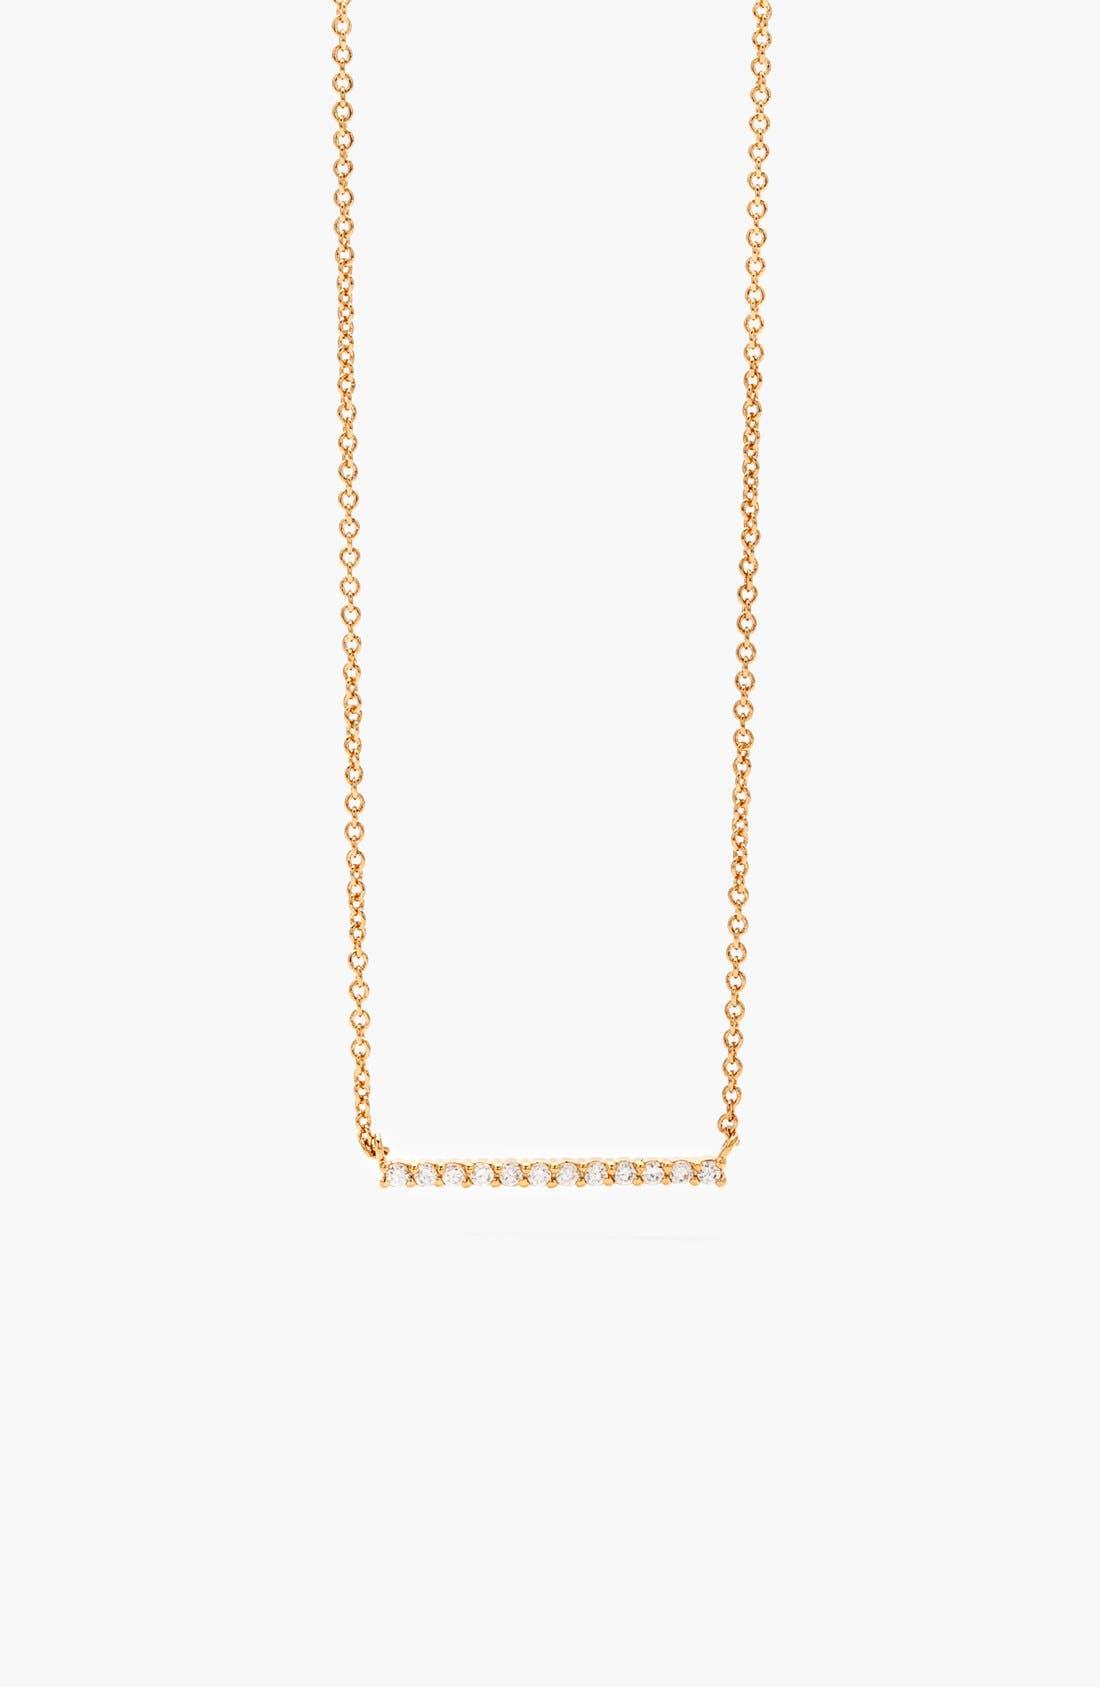 Main Image - gorjana 'Knox' Pavé Bar Necklace